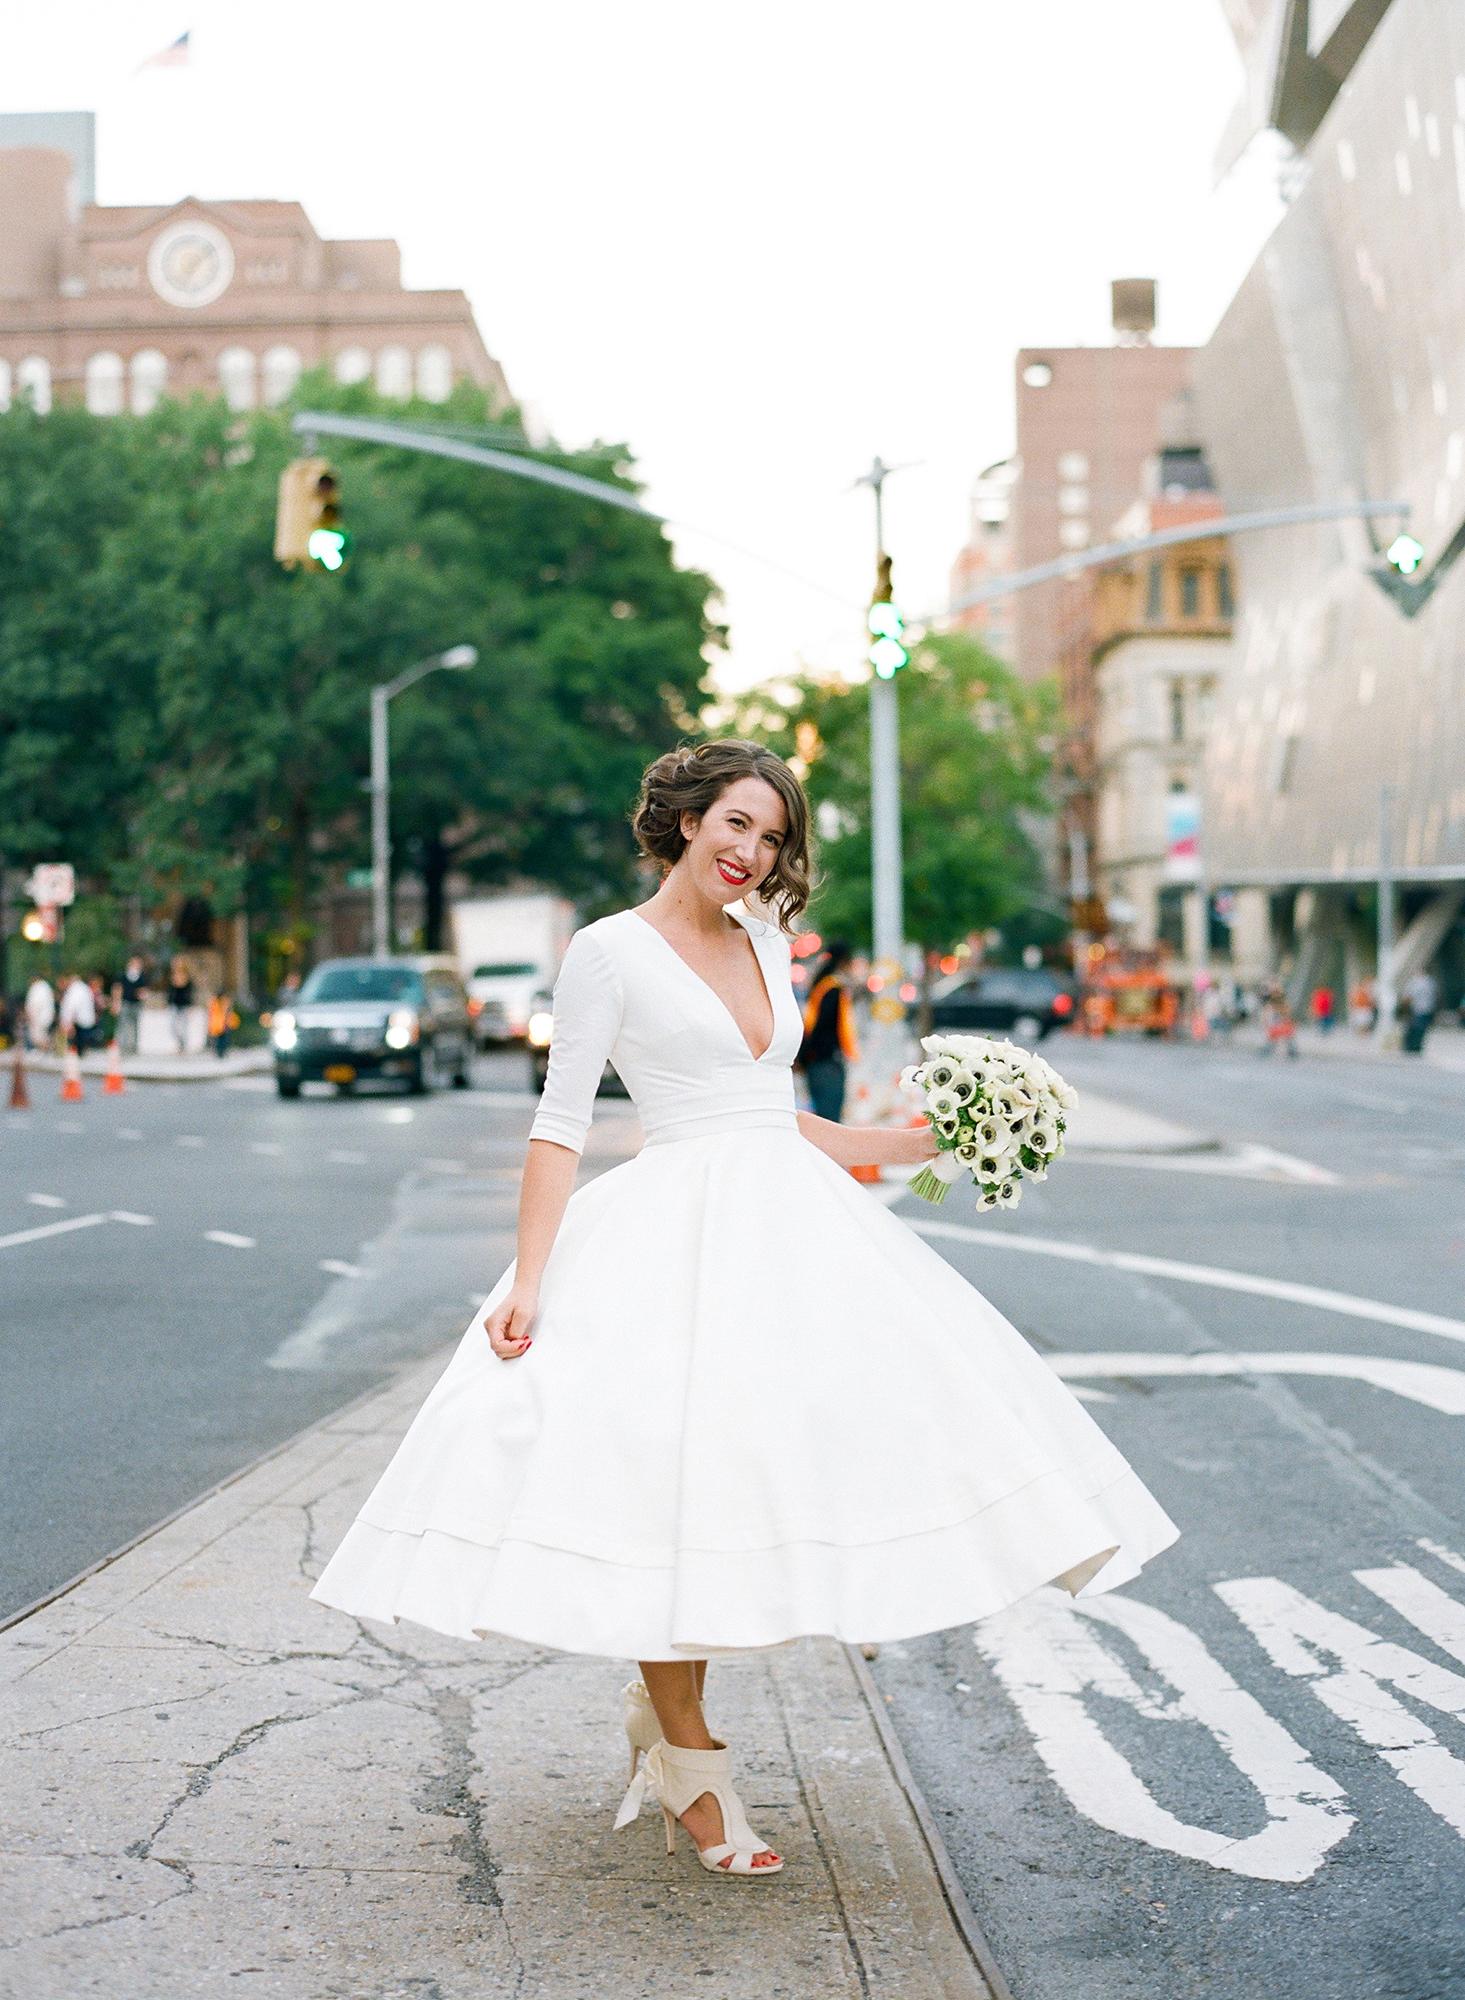 tea length wedding dress with petite bouquet